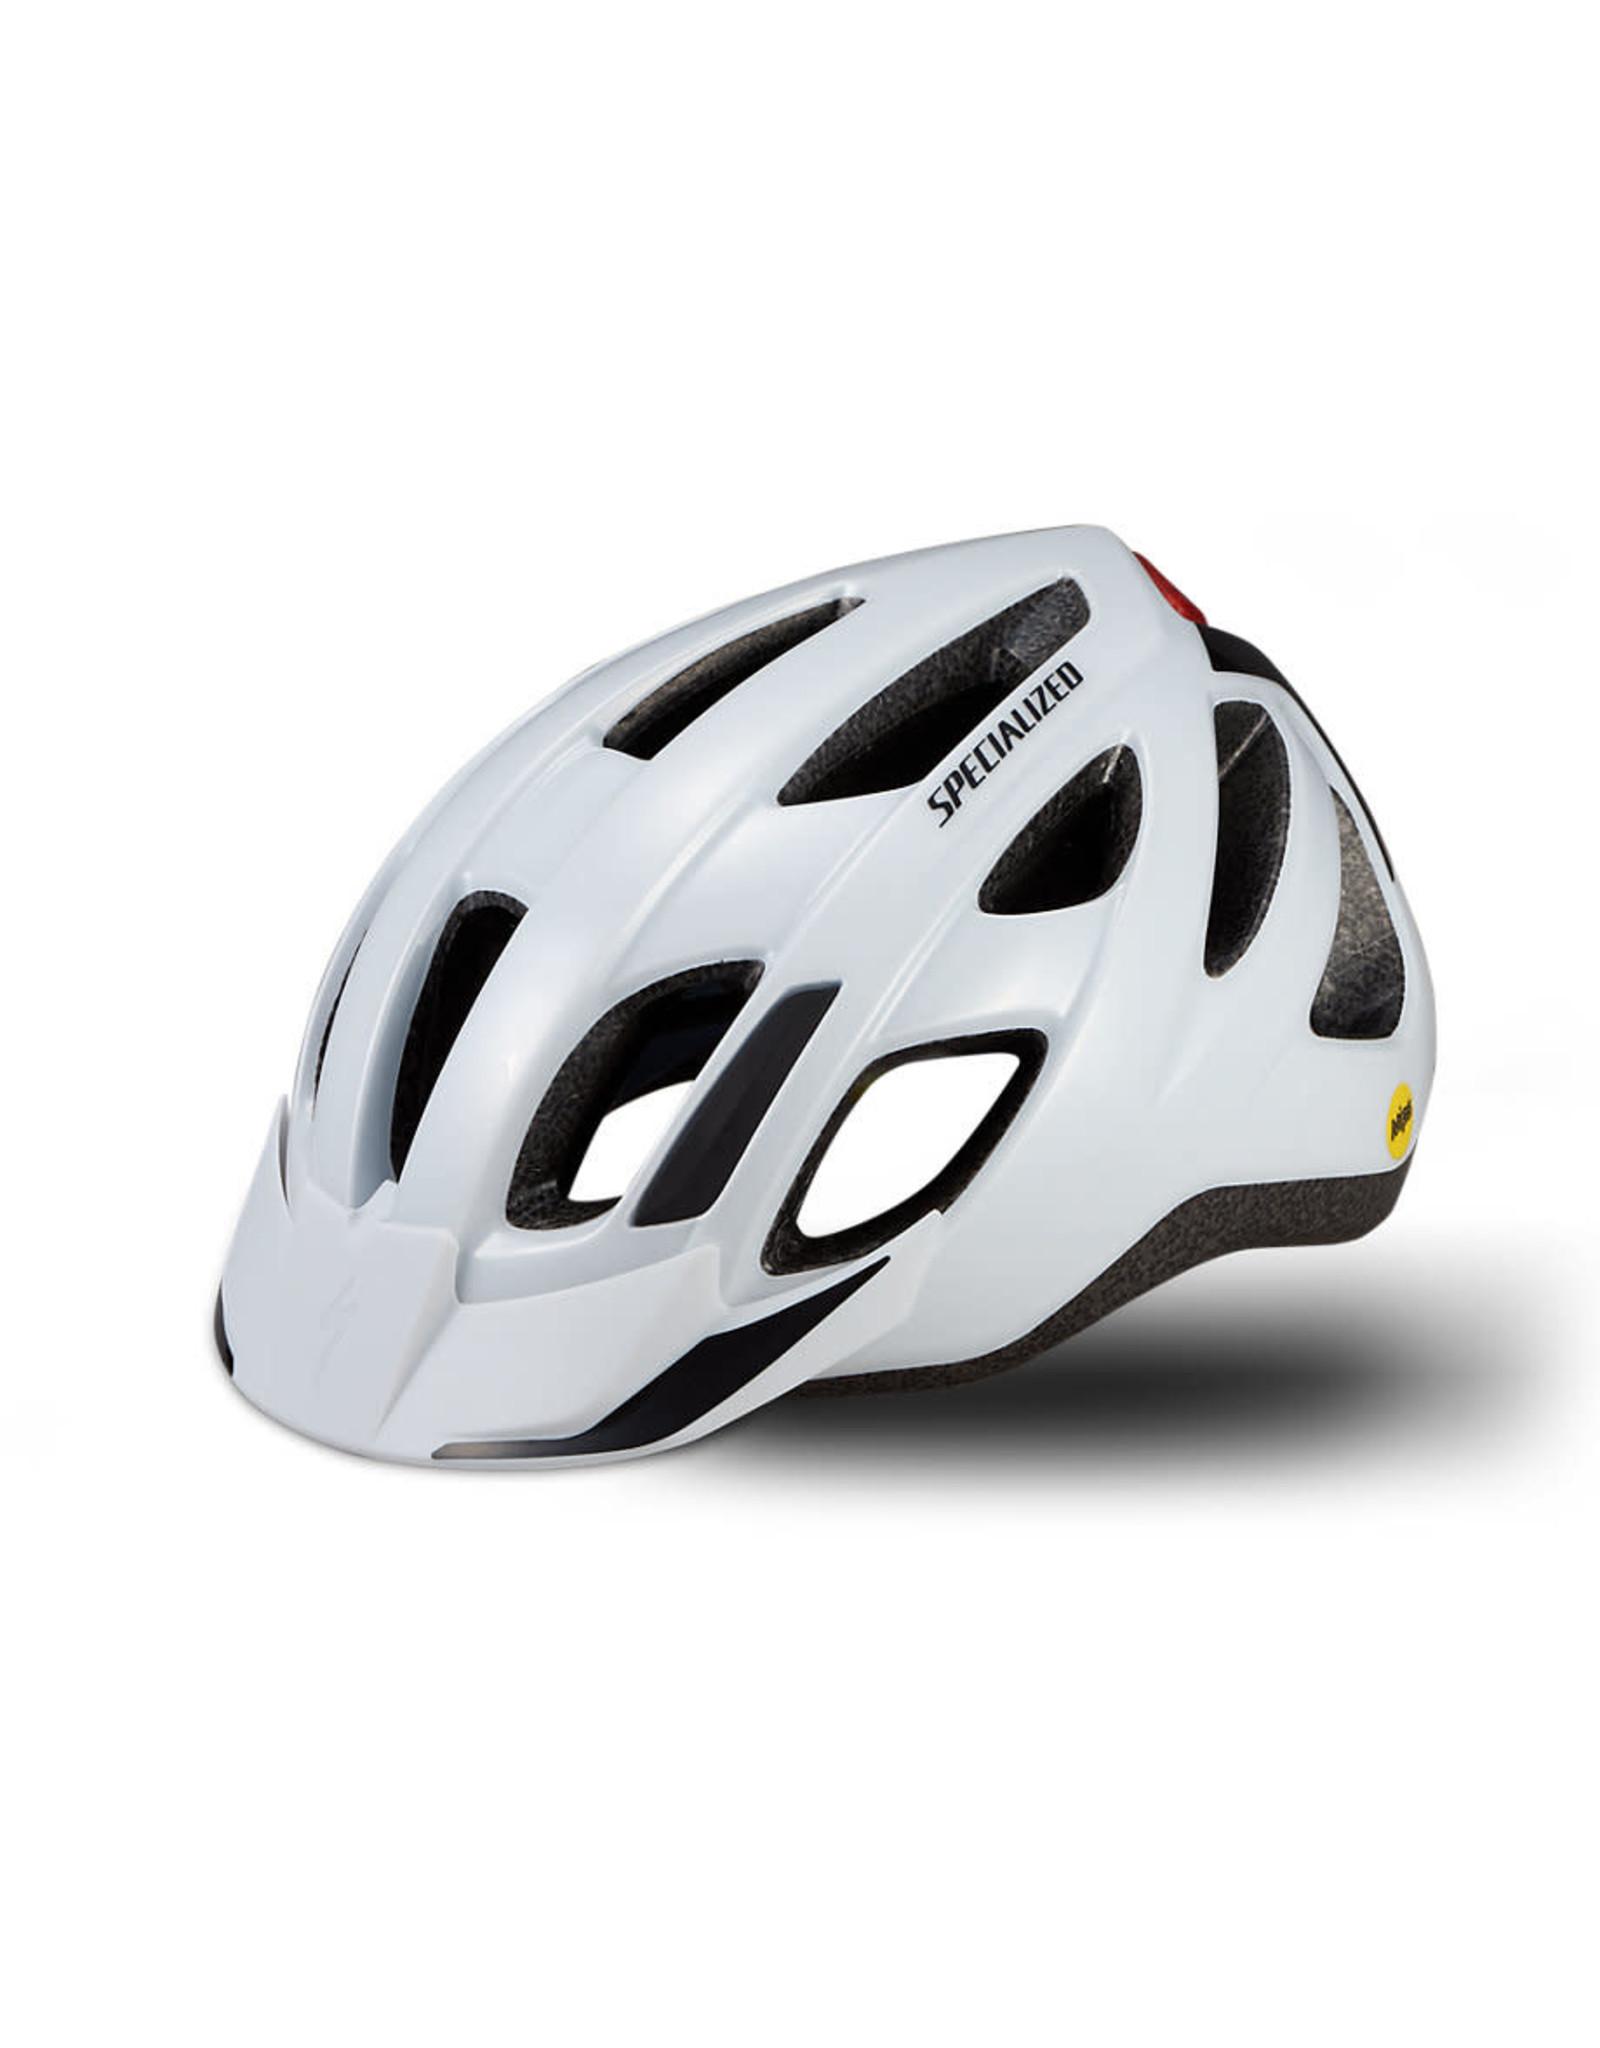 Specialized SPECIALIZED, Centro LED, Helmet.